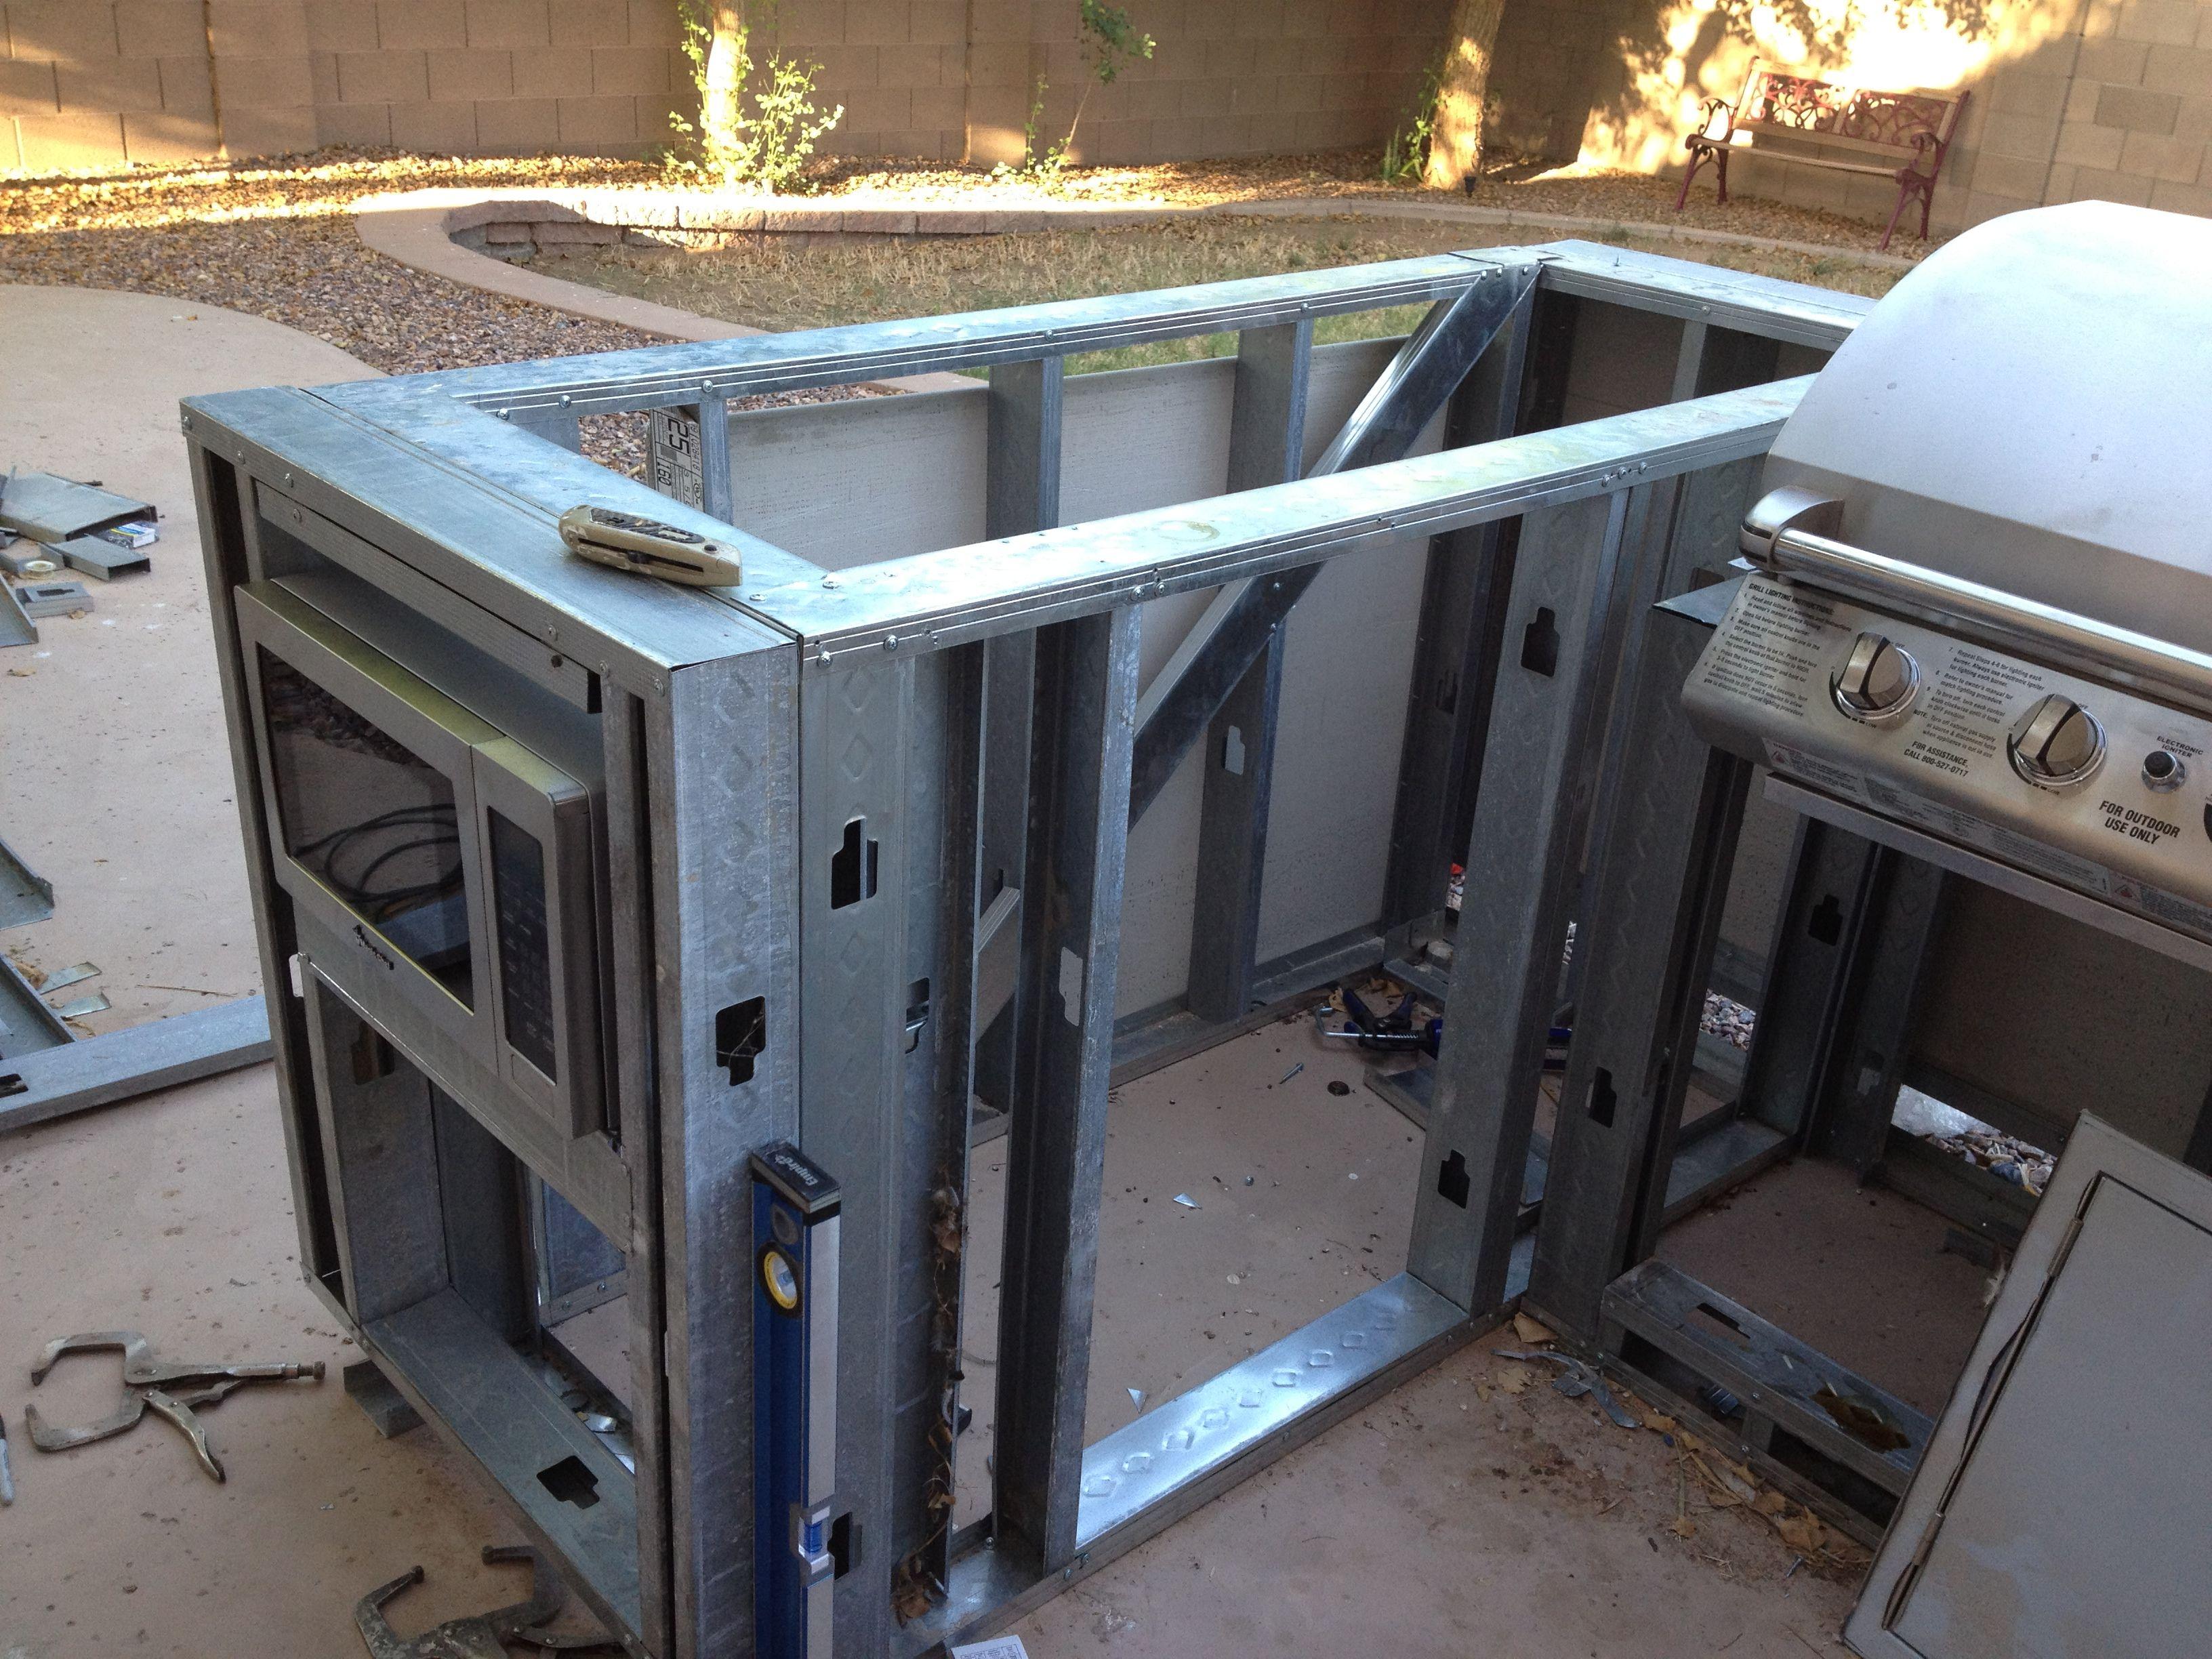 Prefab Outdoor Kitchen Frames Resplendent Outdoor Kitchen Frame Plans With Minimalist Prefab